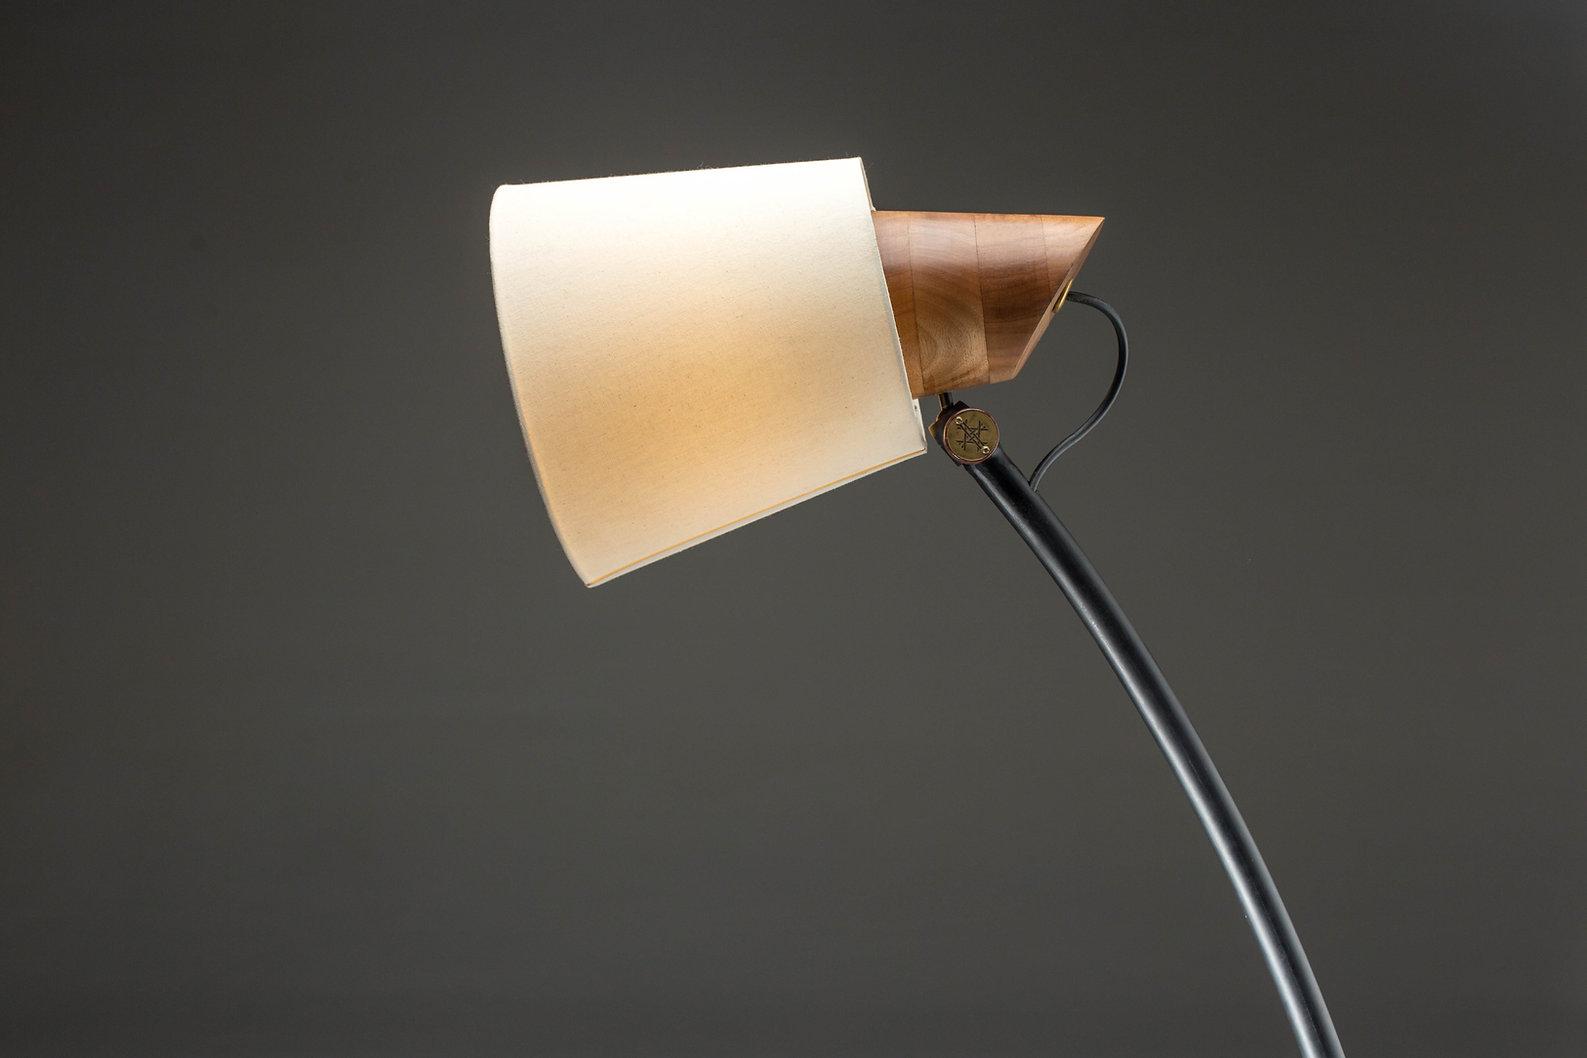 Lampejo Posição 01.jpg